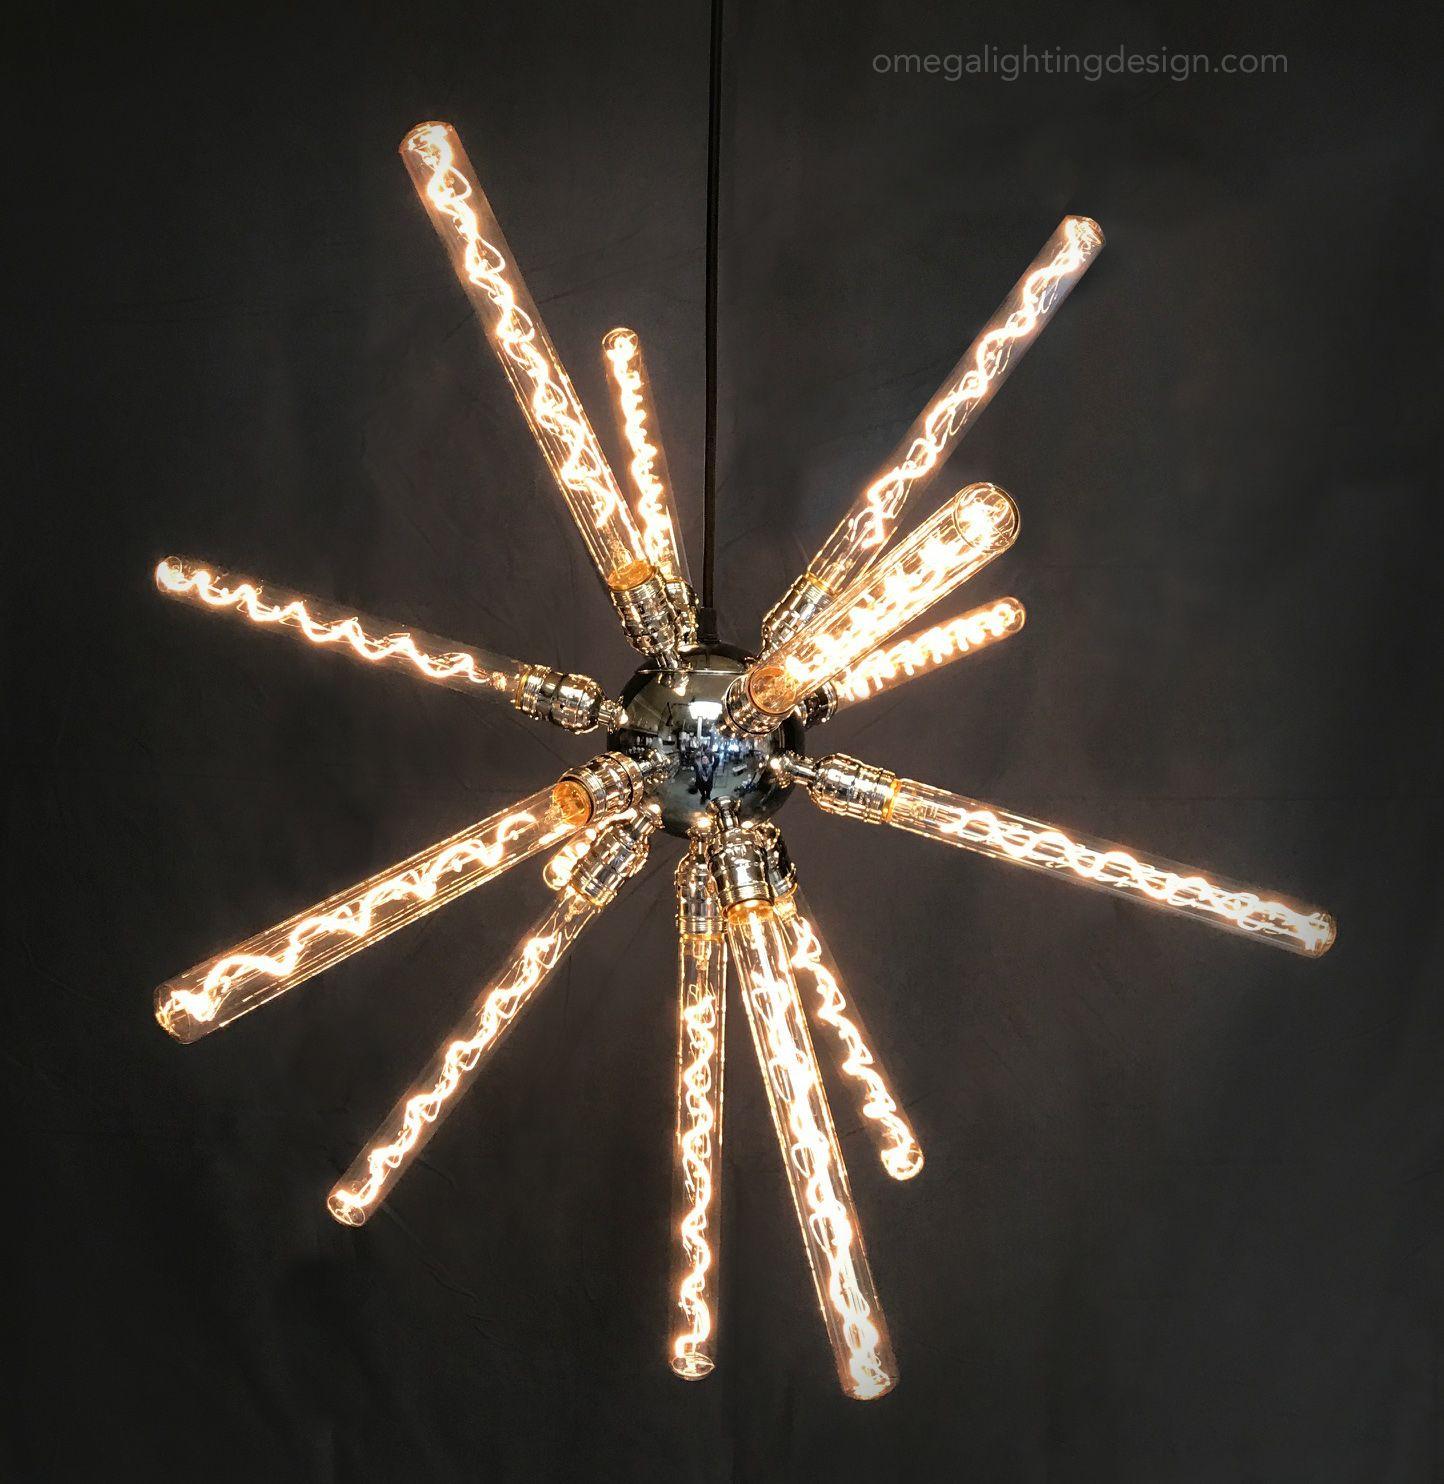 Made By Omega Lighting Design In Berkeley Ca